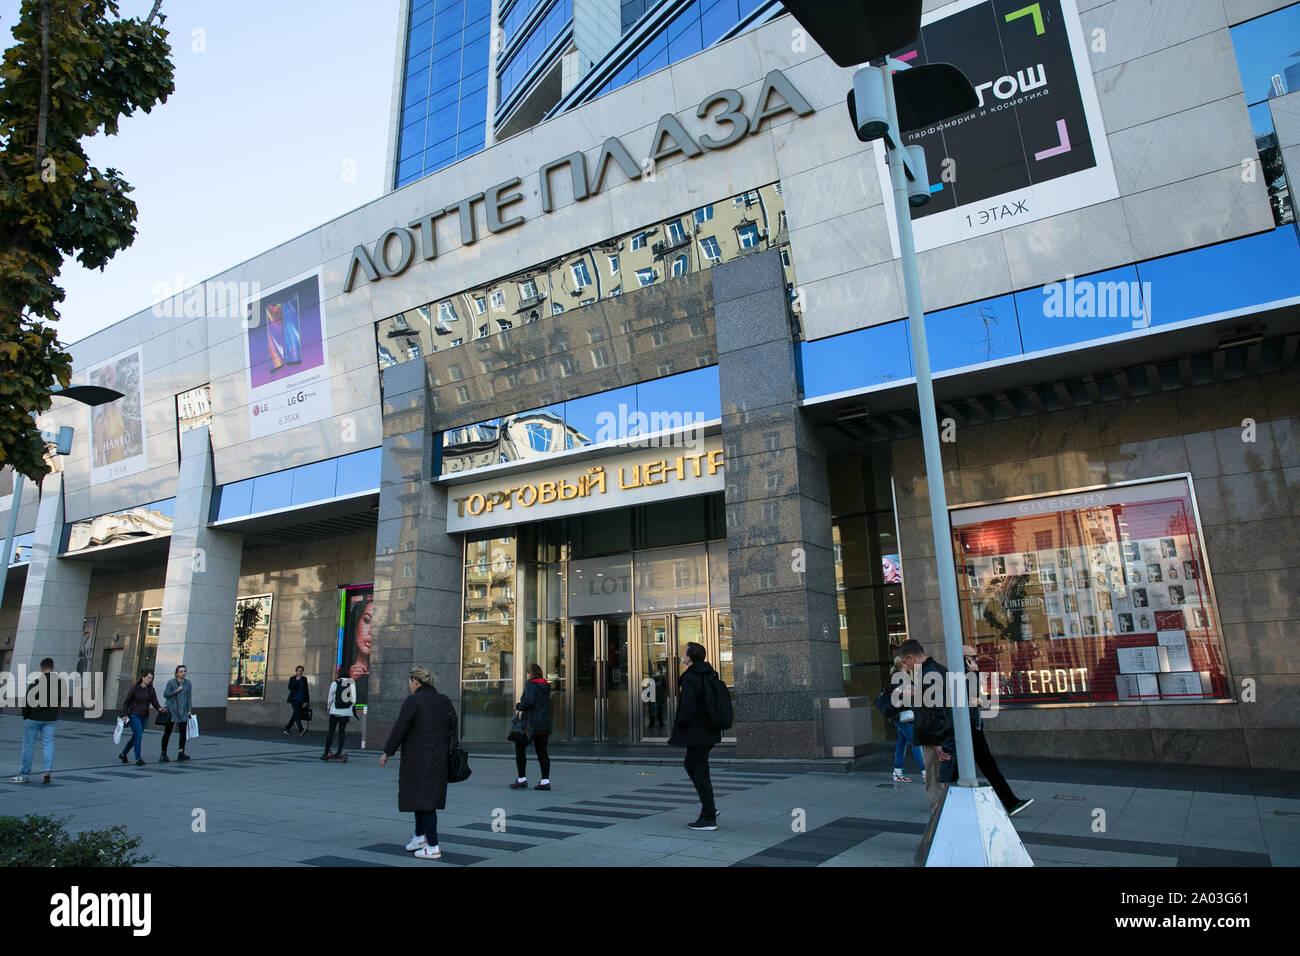 Lotte Plaza Trade Center Near Arbat Street Stock Photo Alamy Lotte plaza korean supermarkets in md & va. alamy